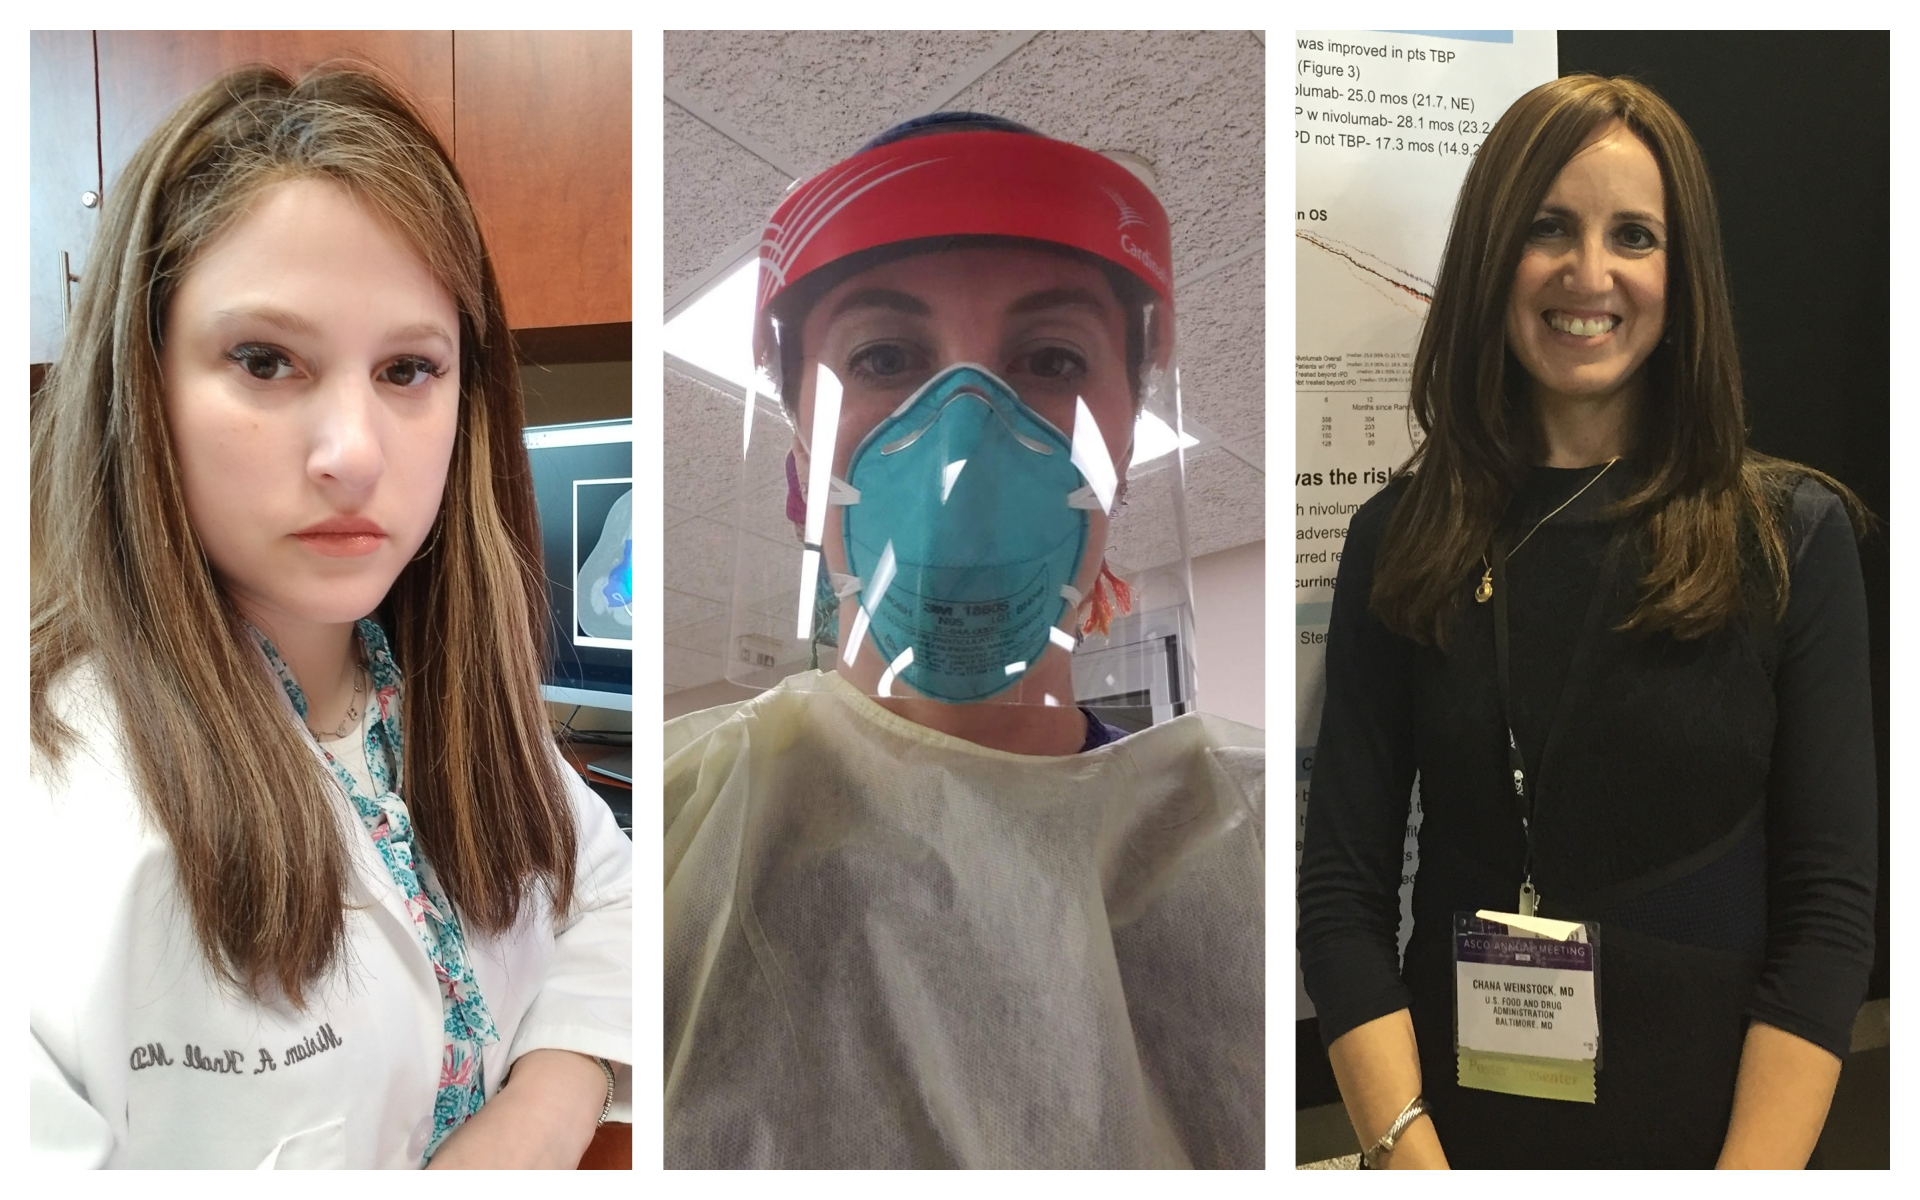 De gauche à droite : Dr. Miriam Knoll, ICU nurse Chaya Milikowski, et Dr. Chana Weinstock Neuberger. (Autorisation)